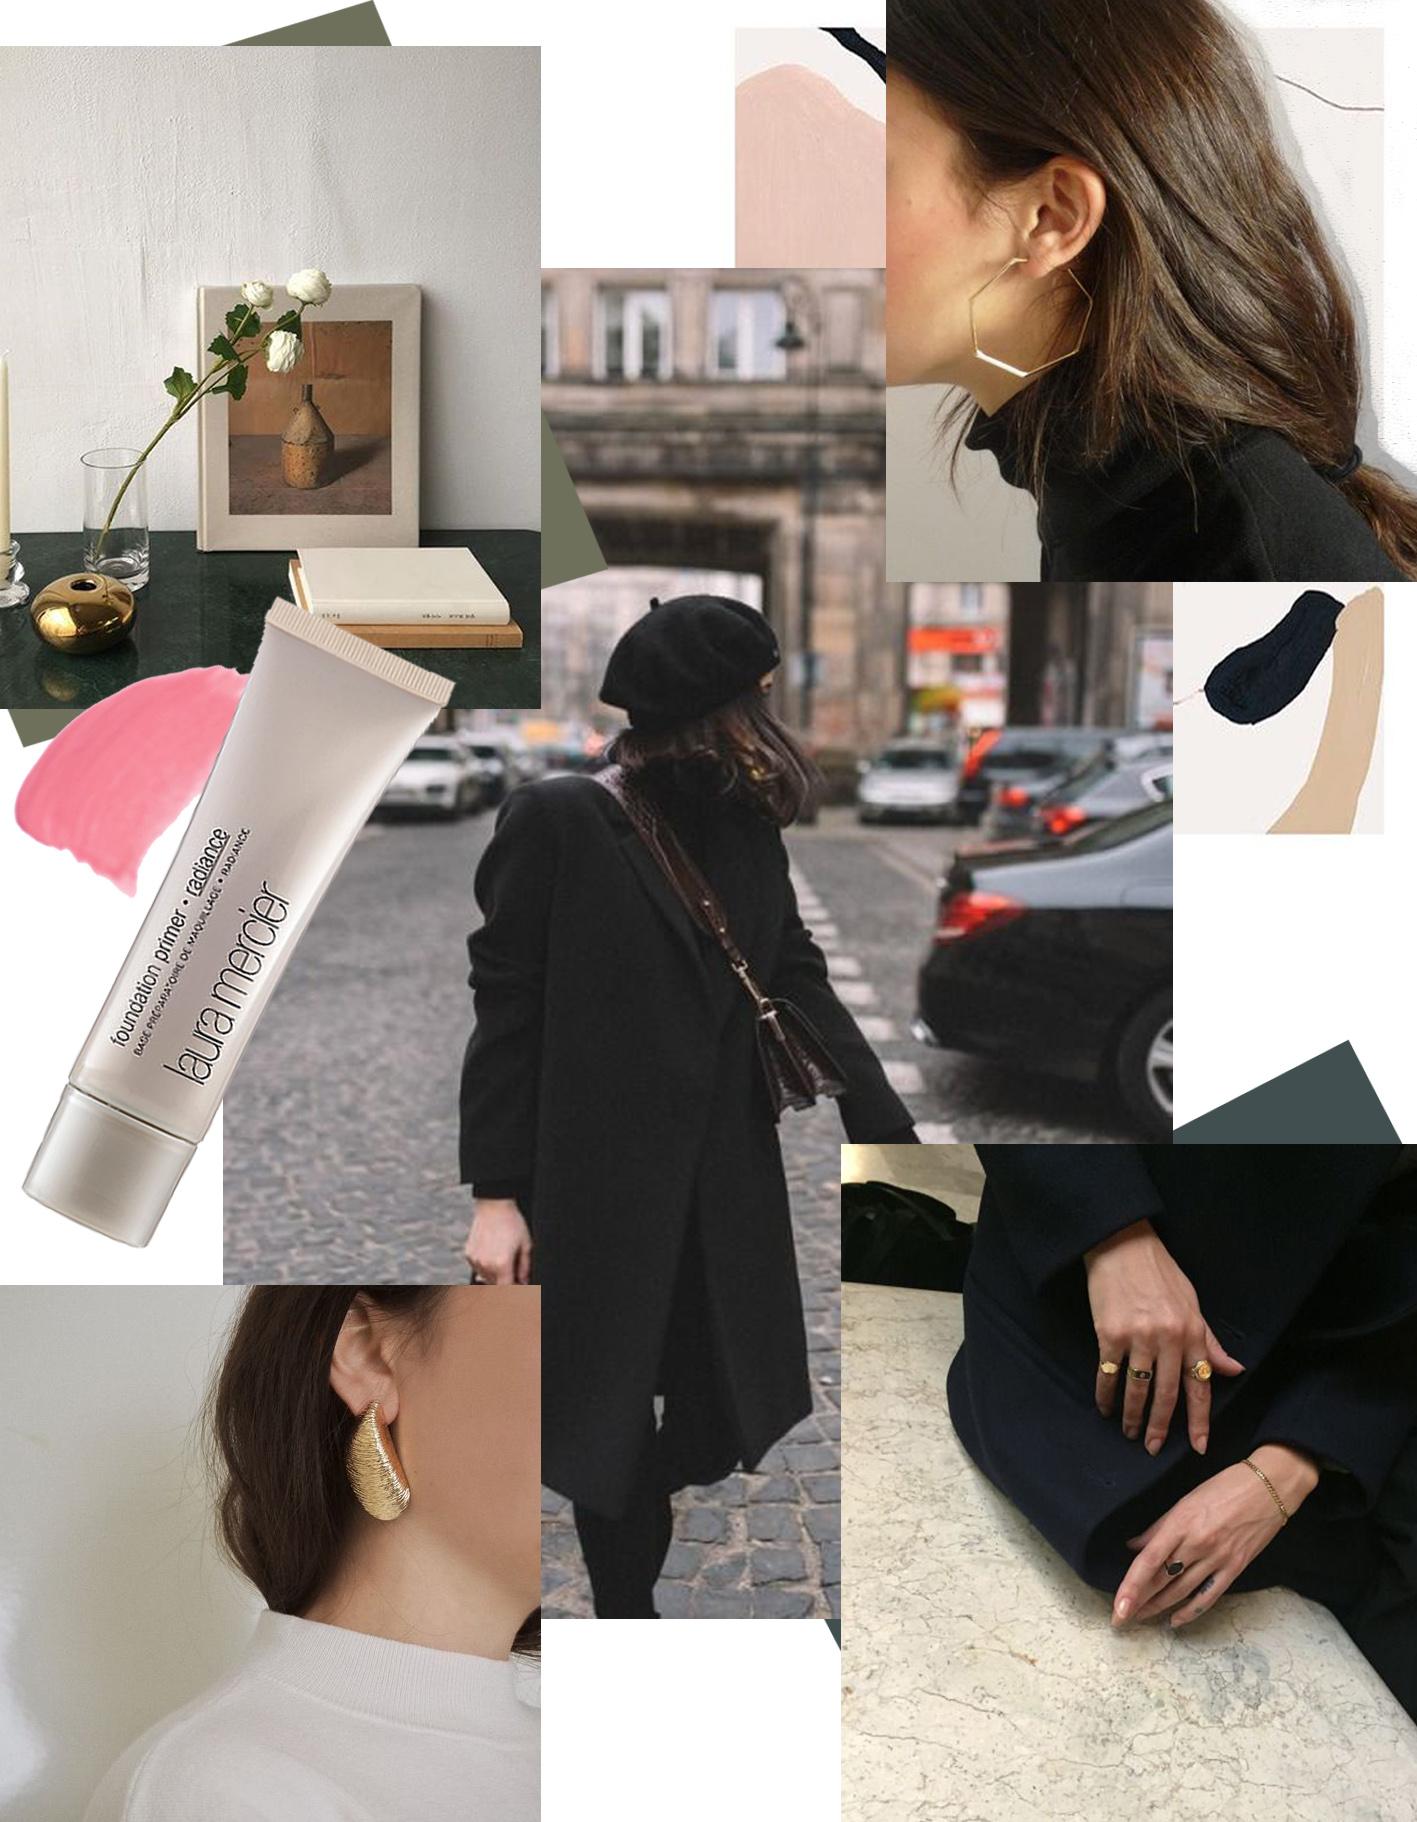 january_mood_board_laura-mercier-radiance-primer.jpg